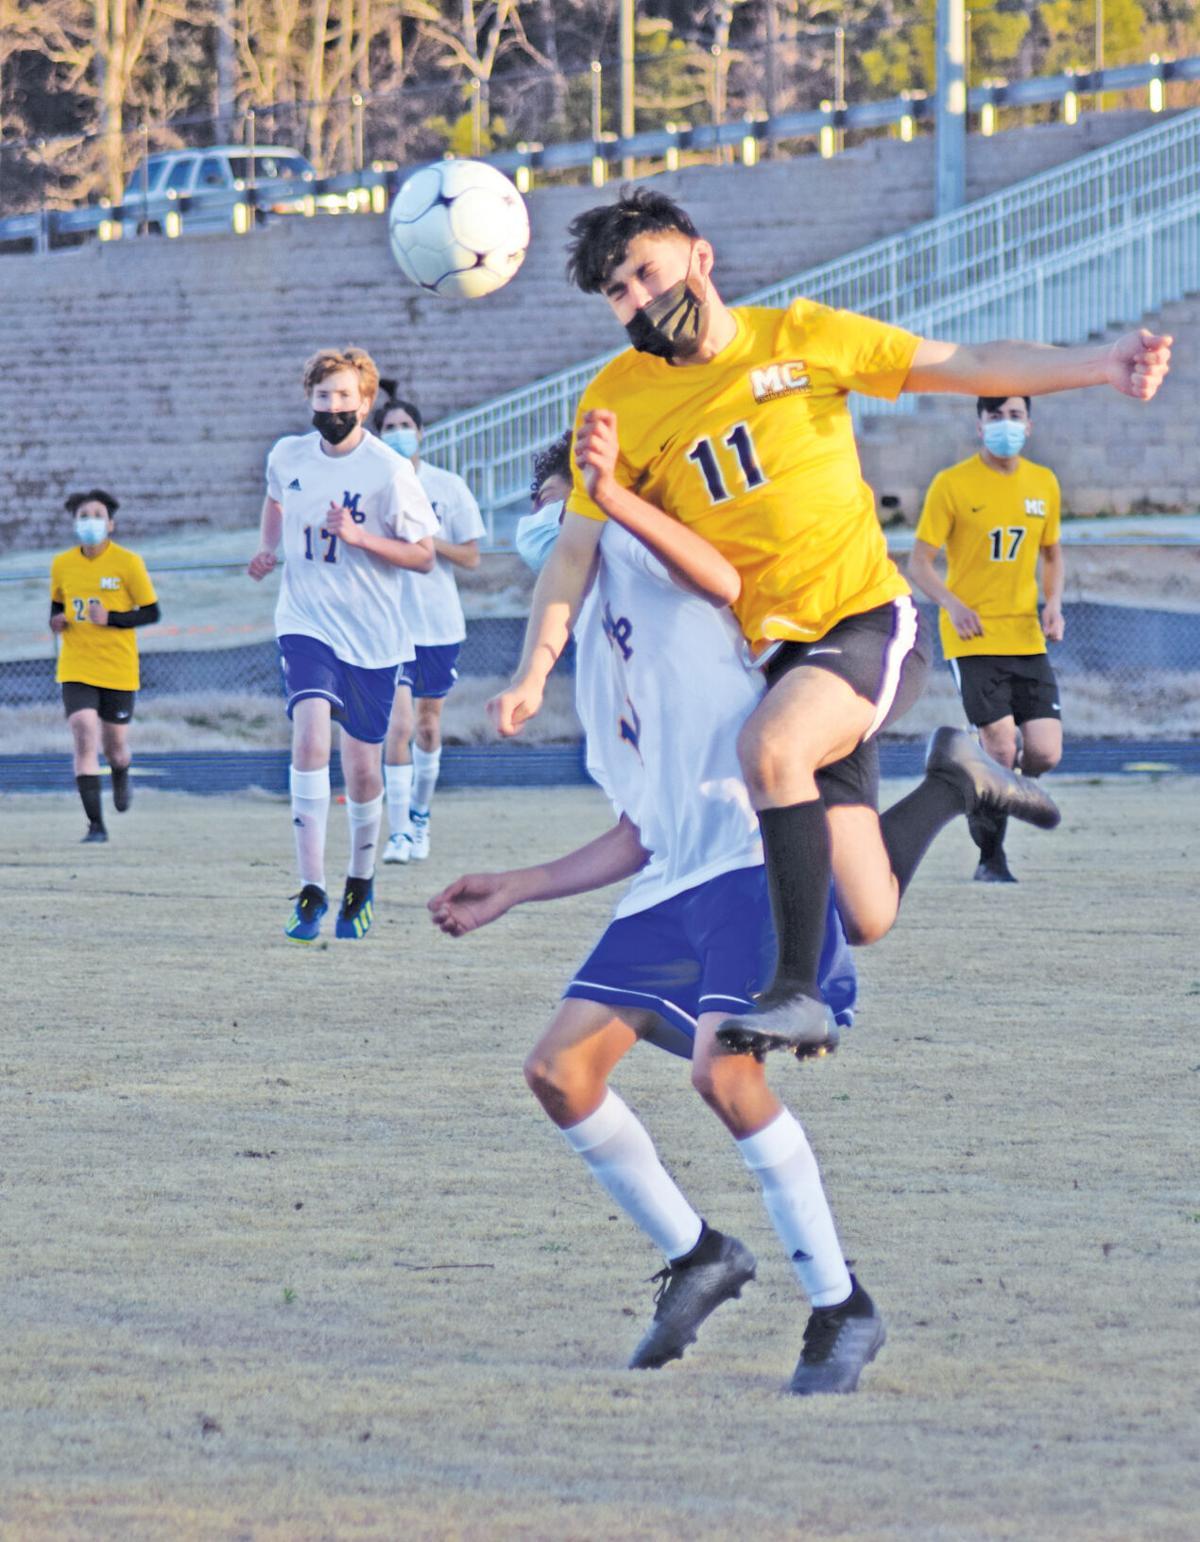 Soccer season kicks off